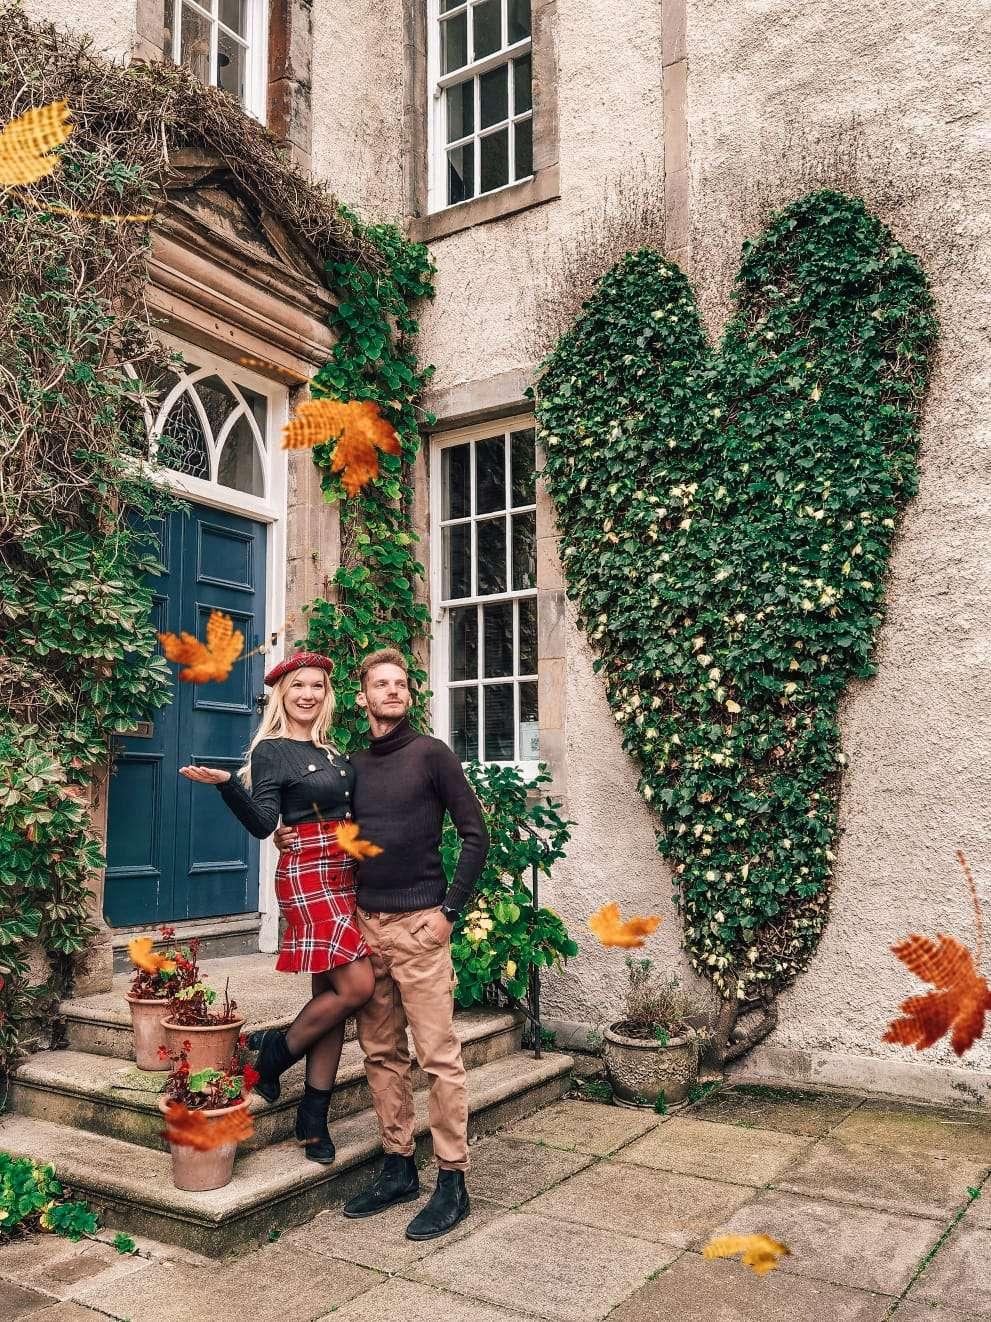 luoghi instagrammabili a Edimburgo-cuore-chessel-court